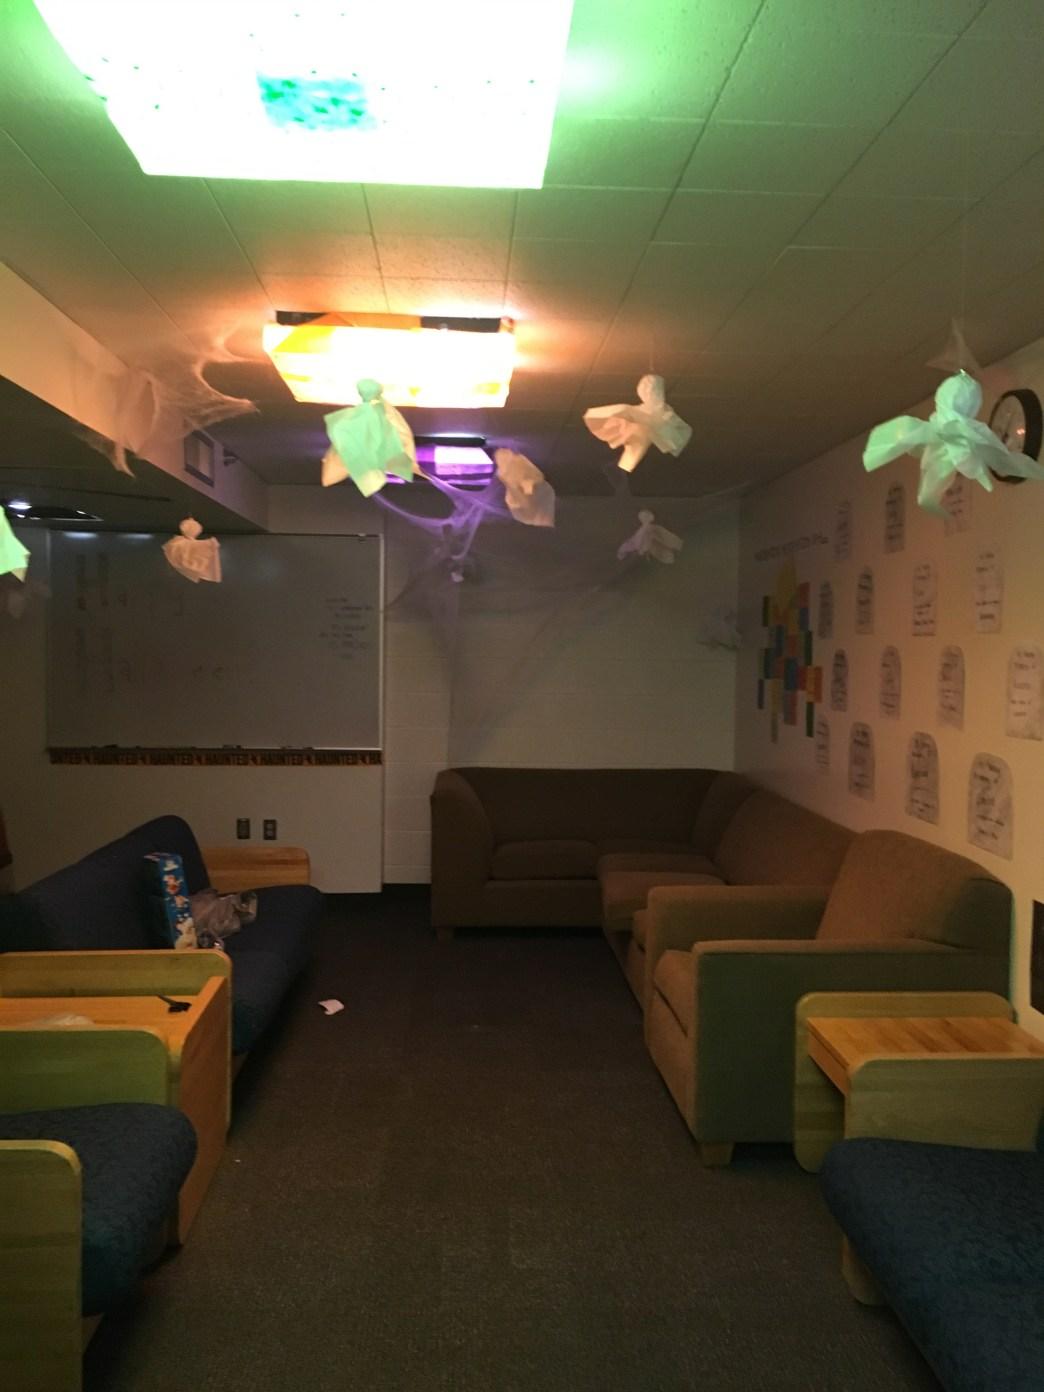 Hall Lounge Decorations 3